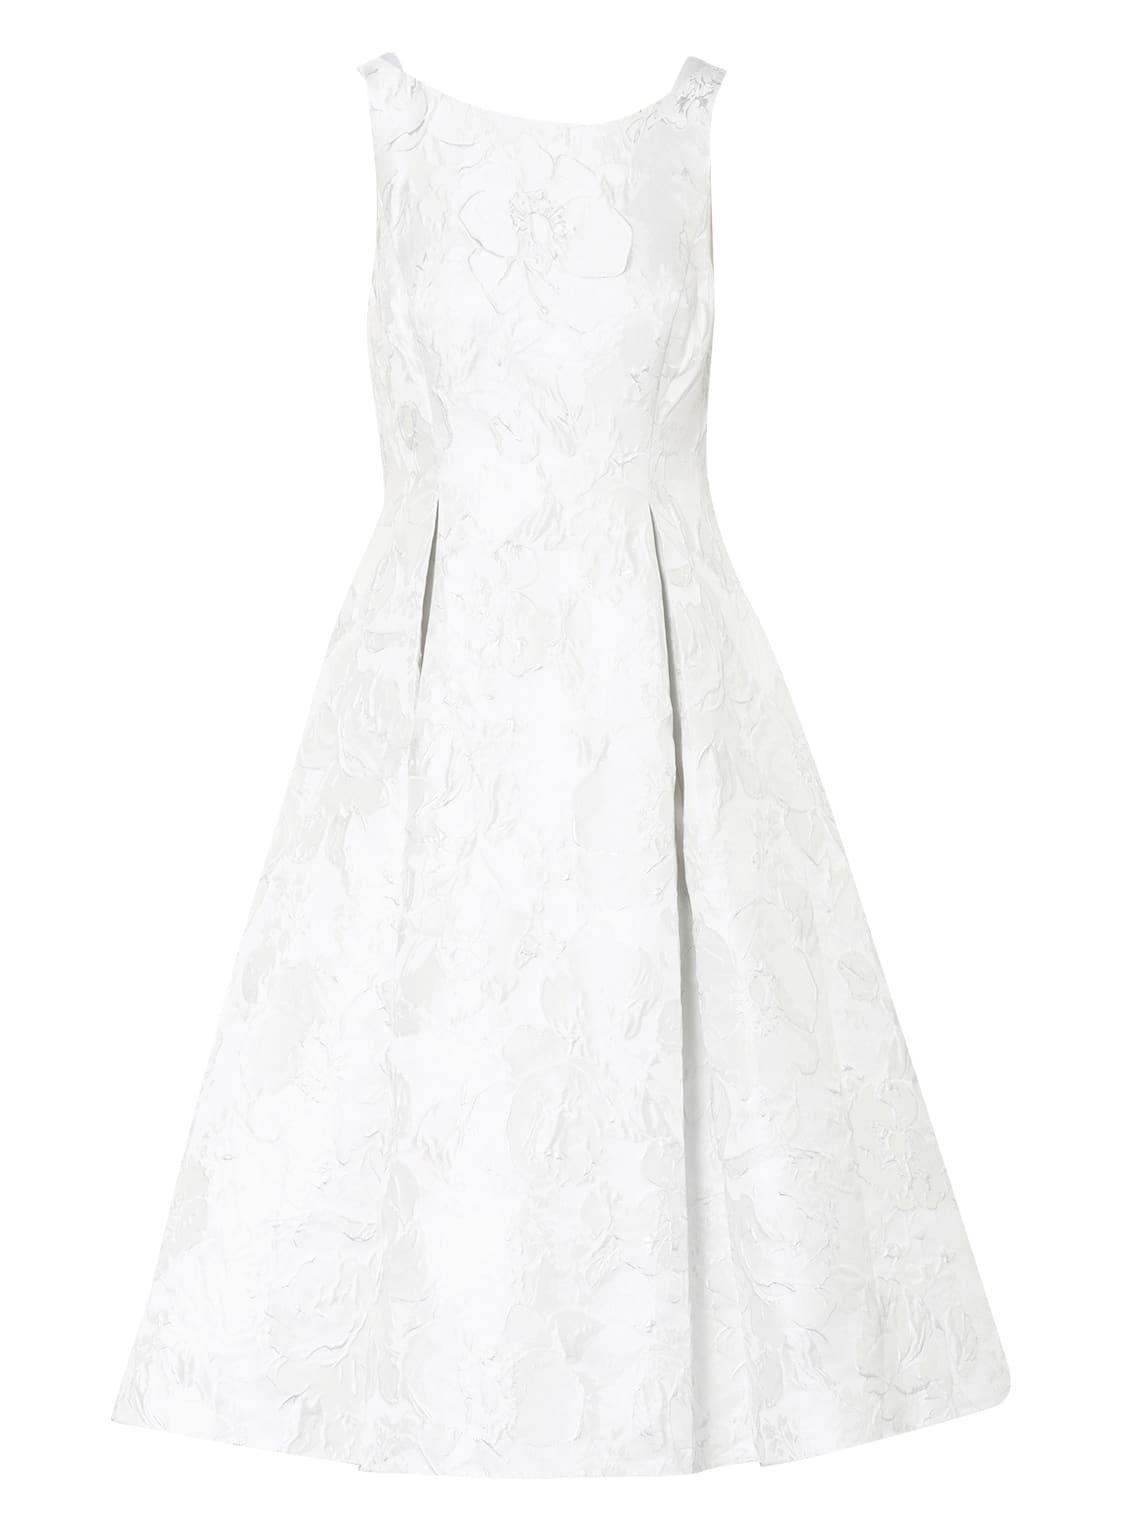 Image of Adrianna Papell Jacquard-Kleid beige